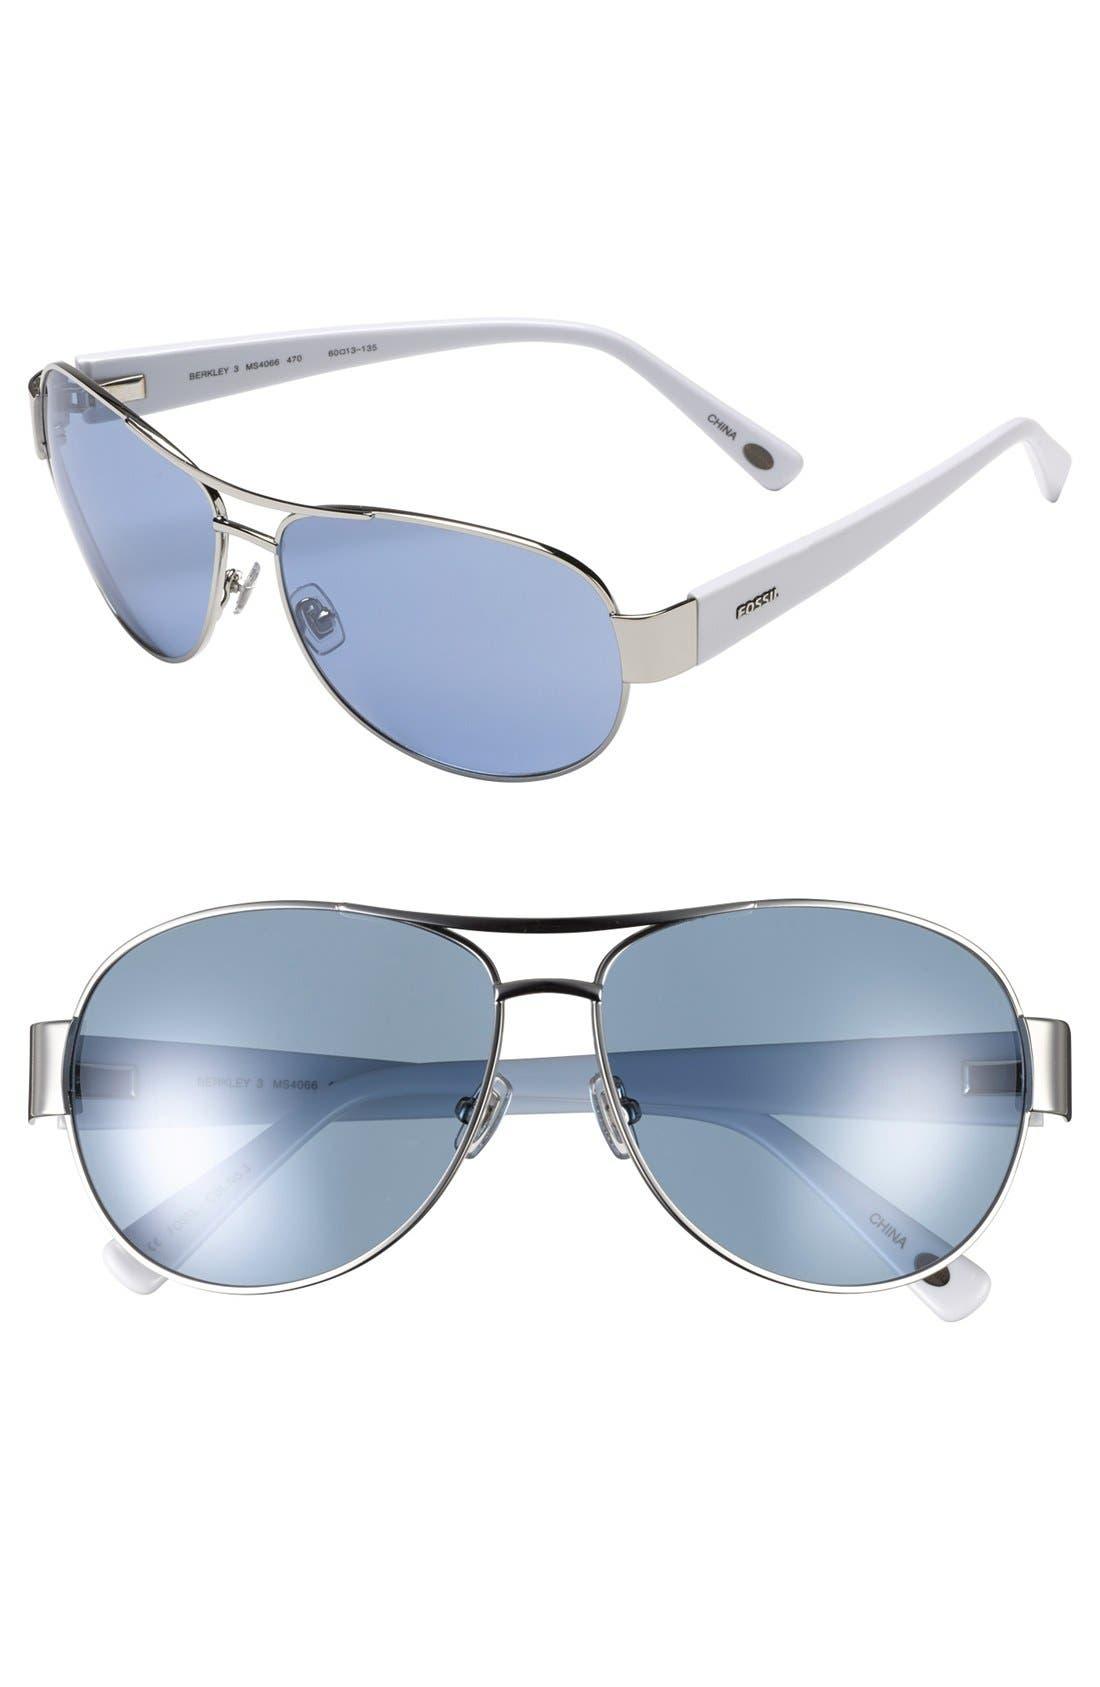 Main Image - Fossil 'Berkley 3' 60mm Aviator Sunglasses